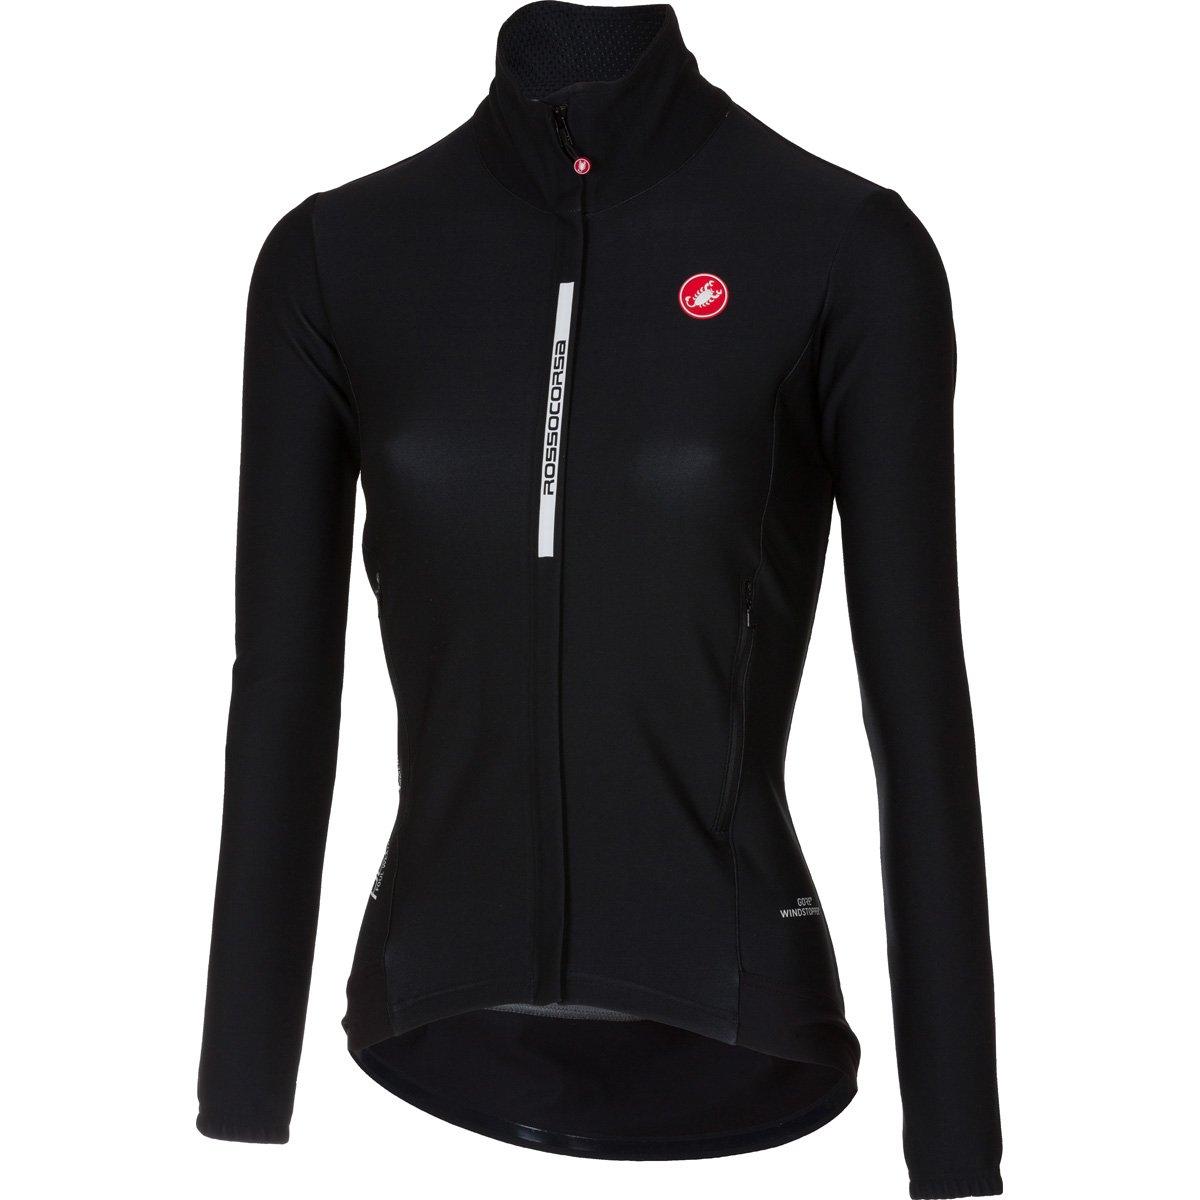 Castelli Perfetto Jersey – Women 's B075ZKW58V Small|ライトブラック ライトブラック Small